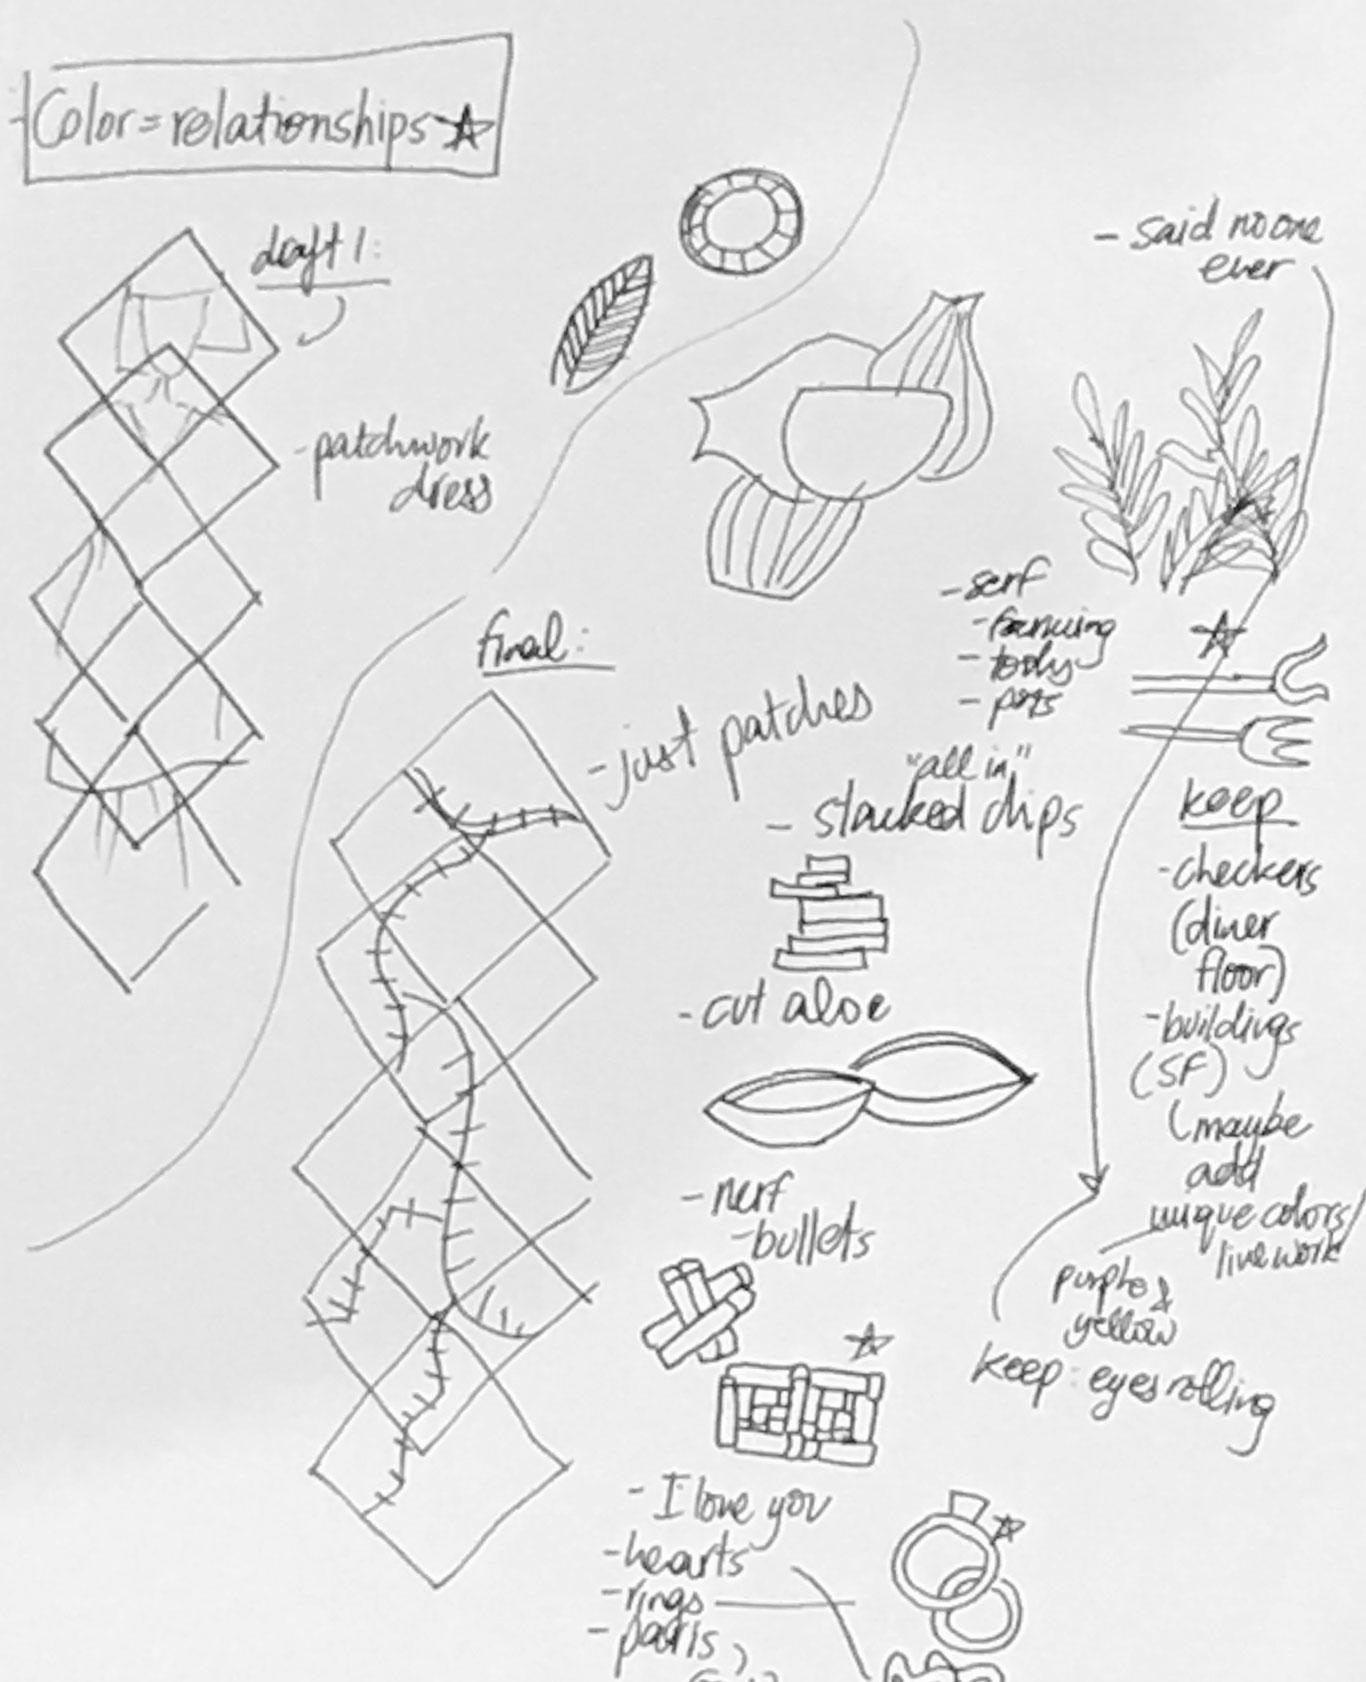 Brainstorming Sketches, Anushka Srinivasan